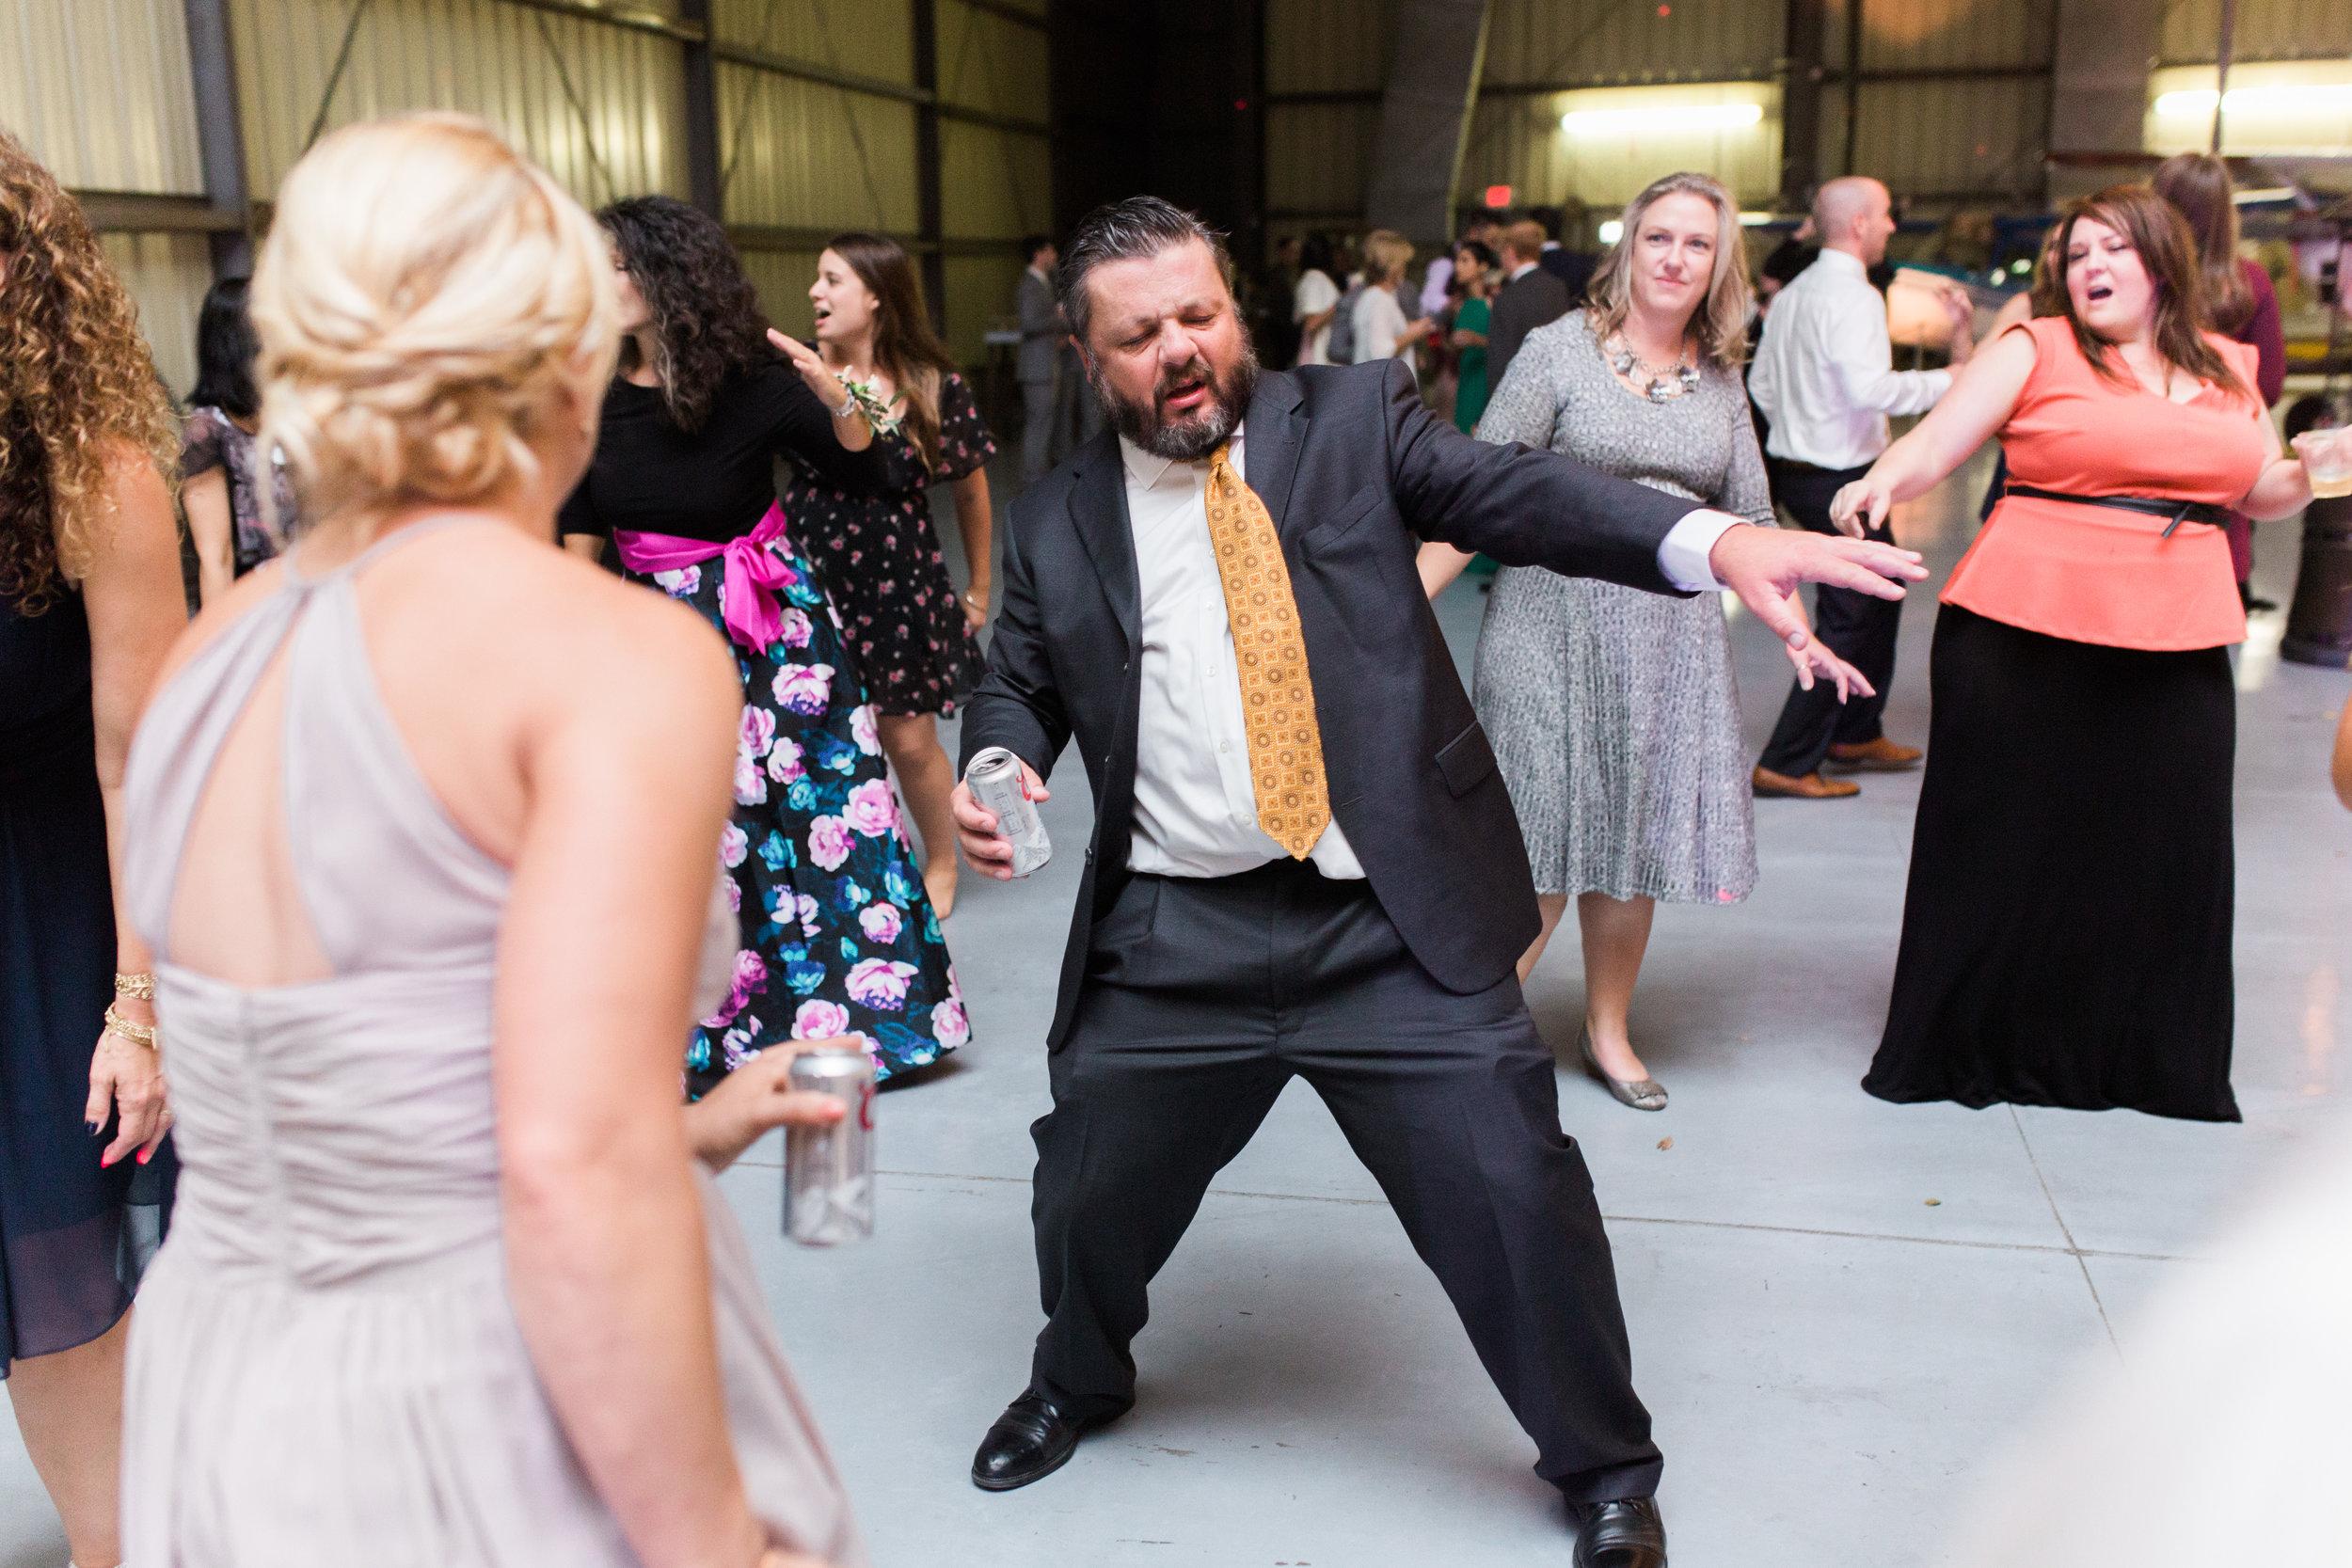 airport-hanger-wedding-at-attitude-aviation-in-livermore-136.jpg